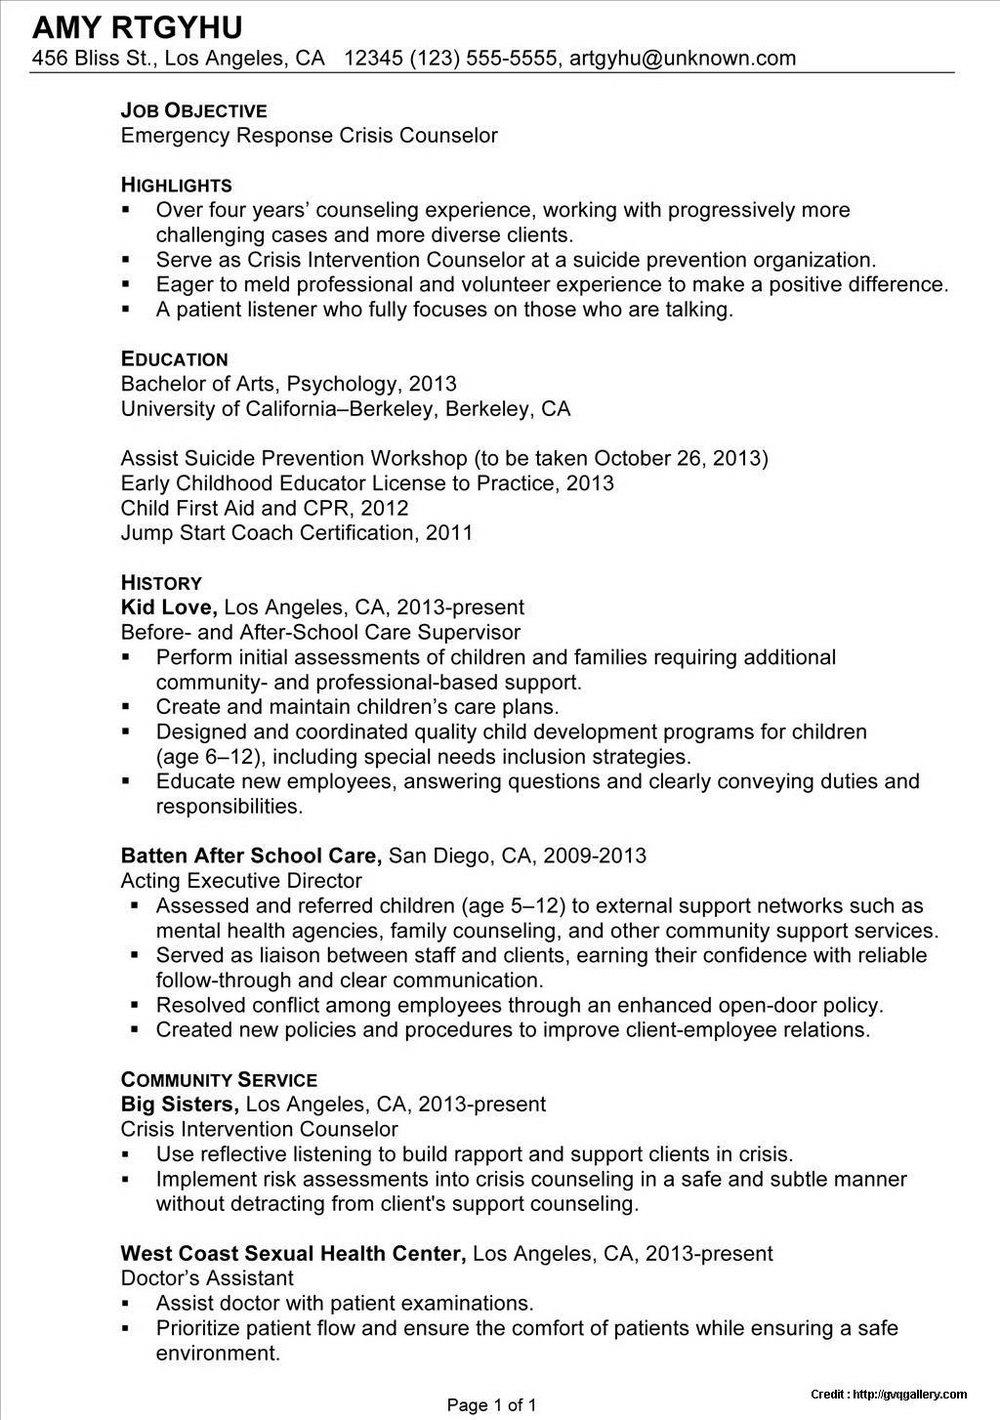 Resume Service San Diego Ca